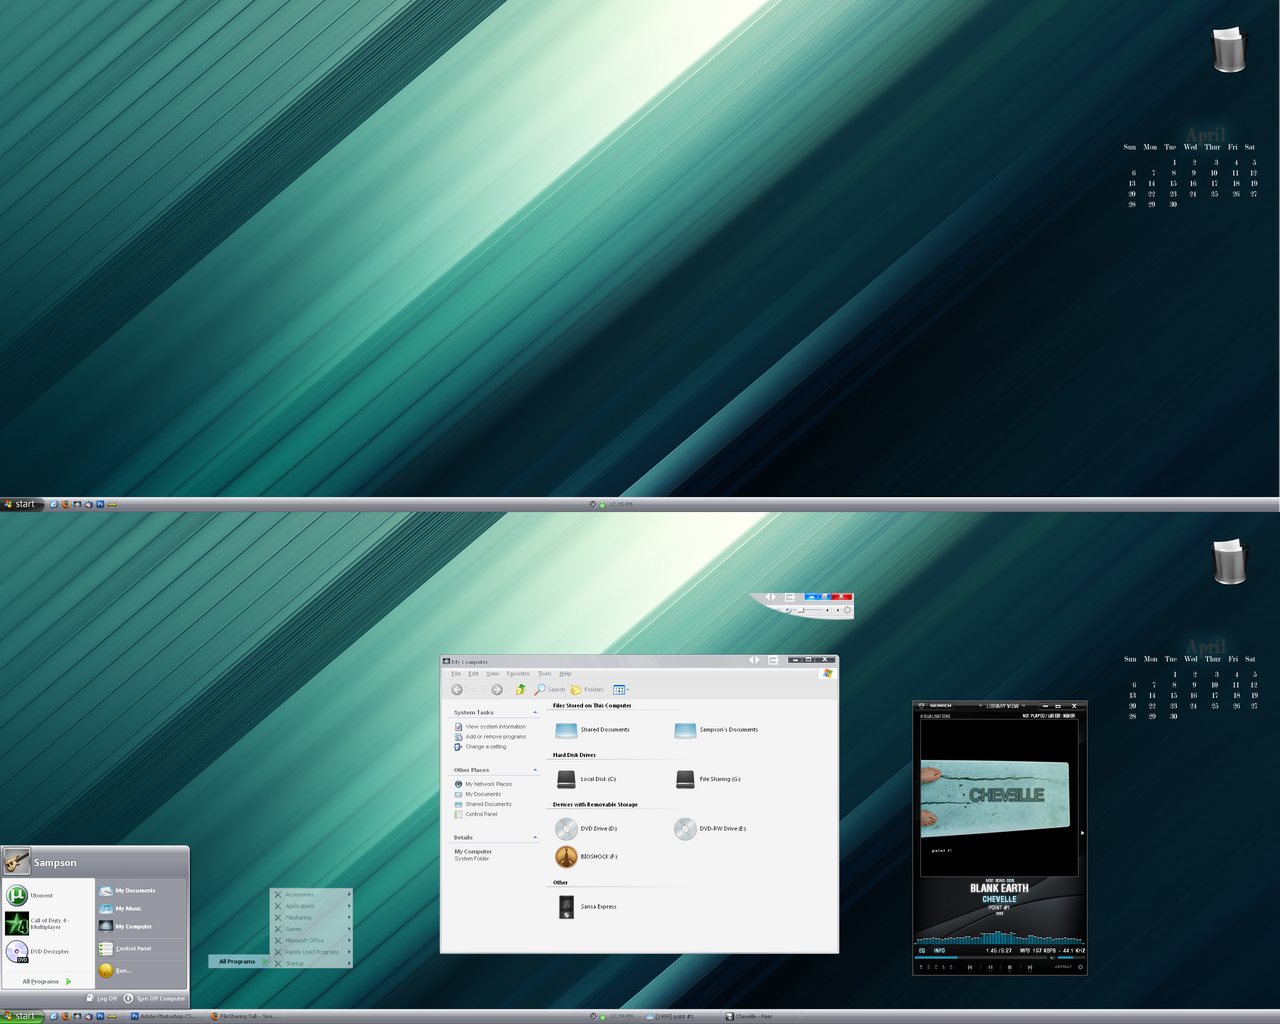 Desktop - April 08 by sgraves